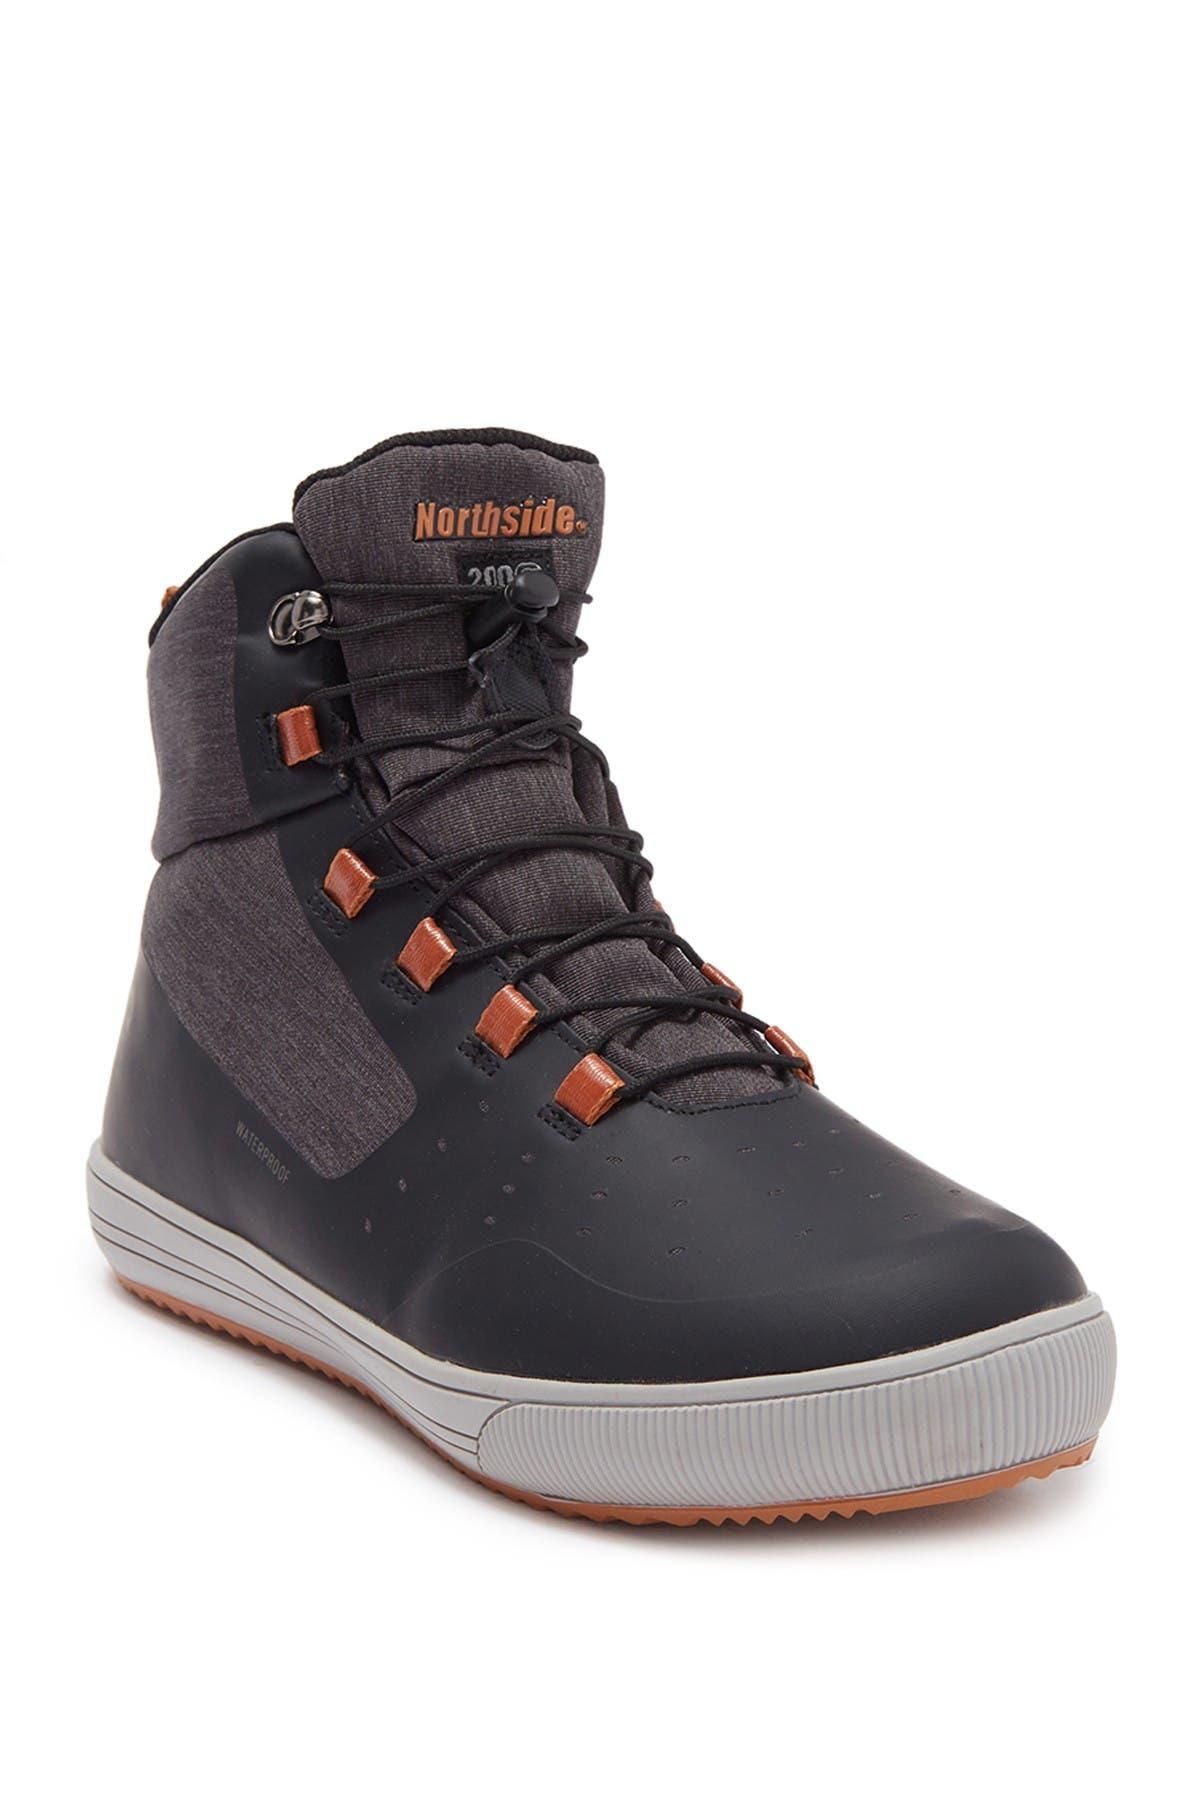 Image of NORTHSIDE Halston High Top Sneaker